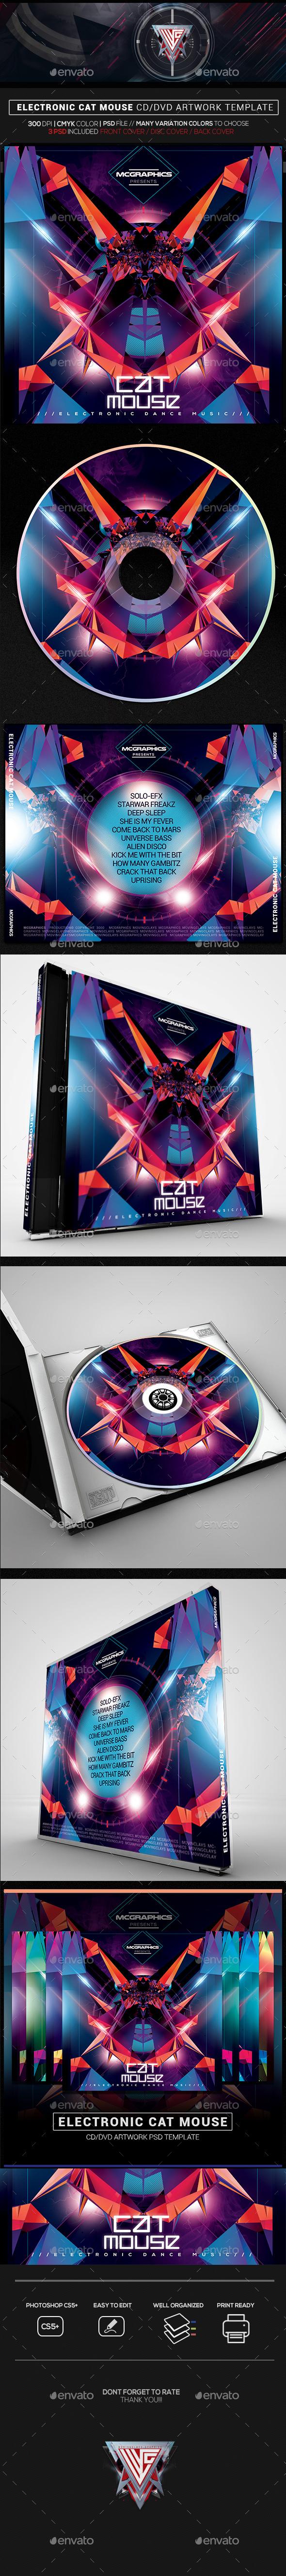 Electronic Cat Mouse CD/DVD Template - CD & DVD Artwork Print Templates